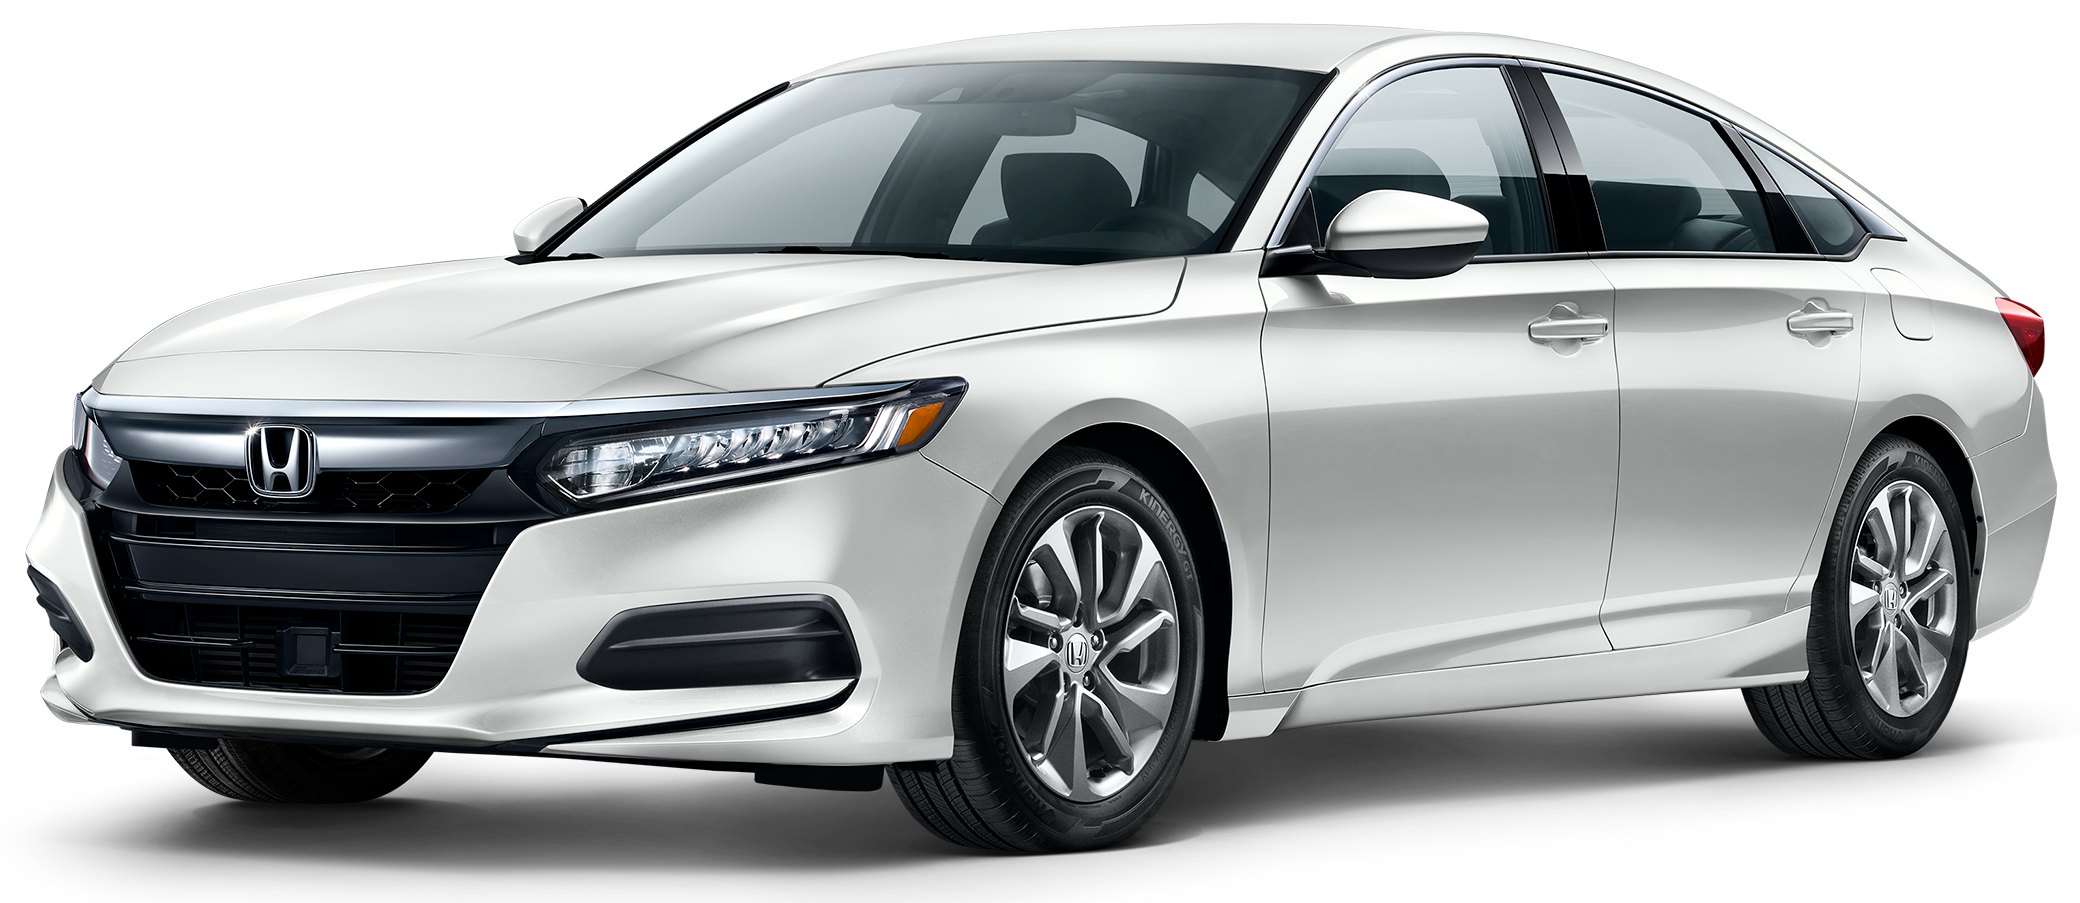 Honda Dealership Az >> 2020 Honda Accord Incentives, Specials & Offers in Moon ...